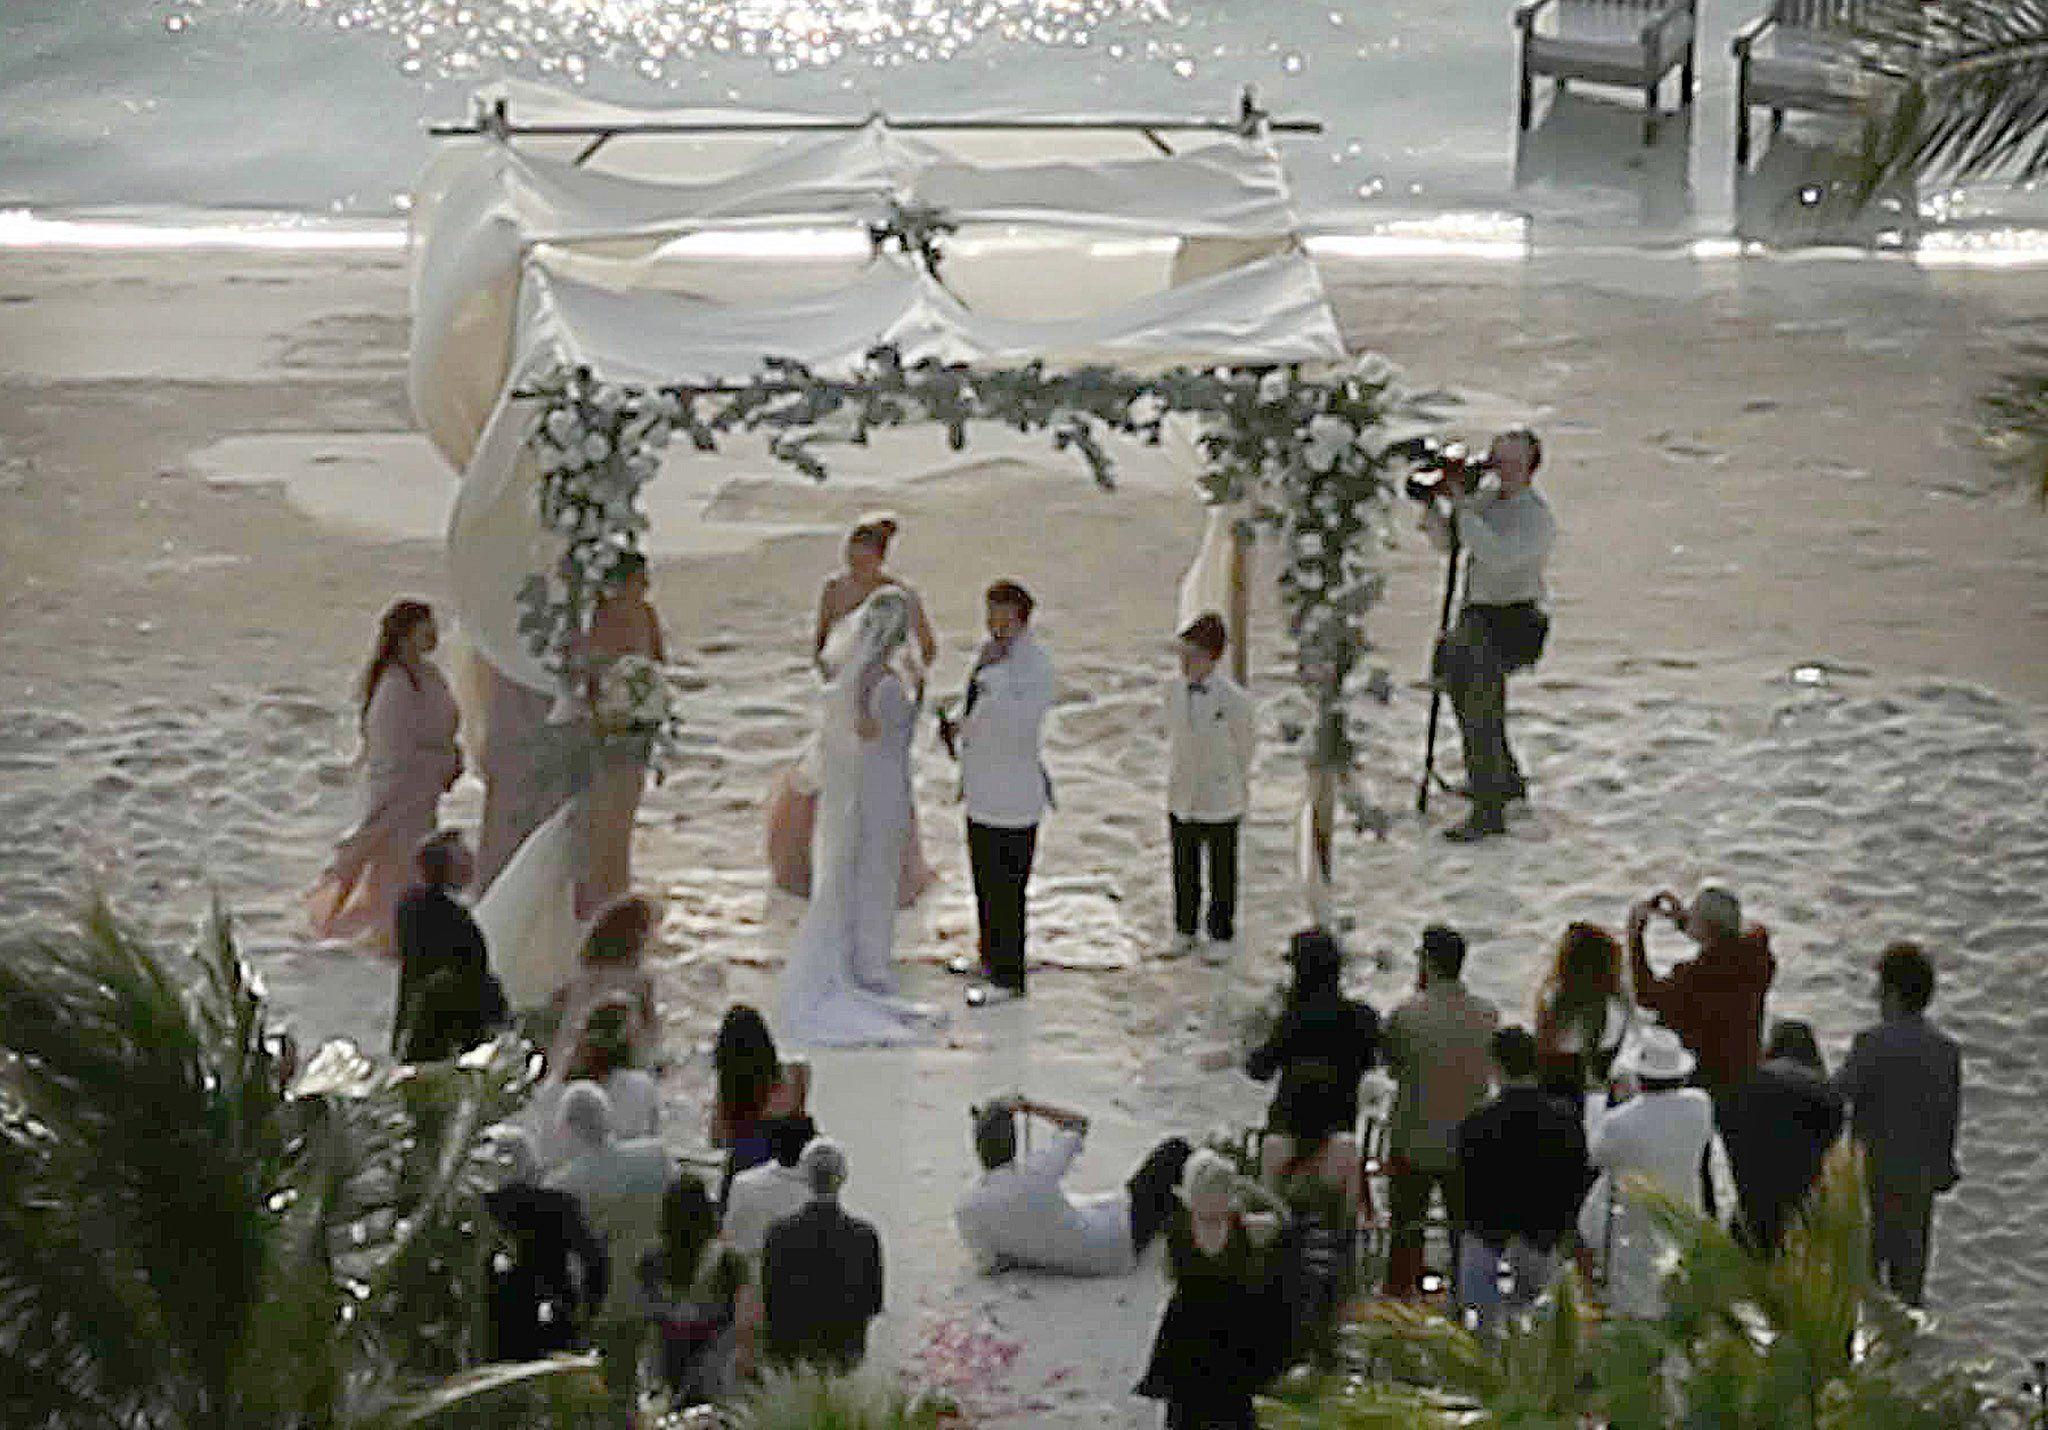 Take A Look At Johnny Depp And Amber Heard S Romantic Beach Wedding Johnny Depp And Amber Private Island Wedding Johnny Depp